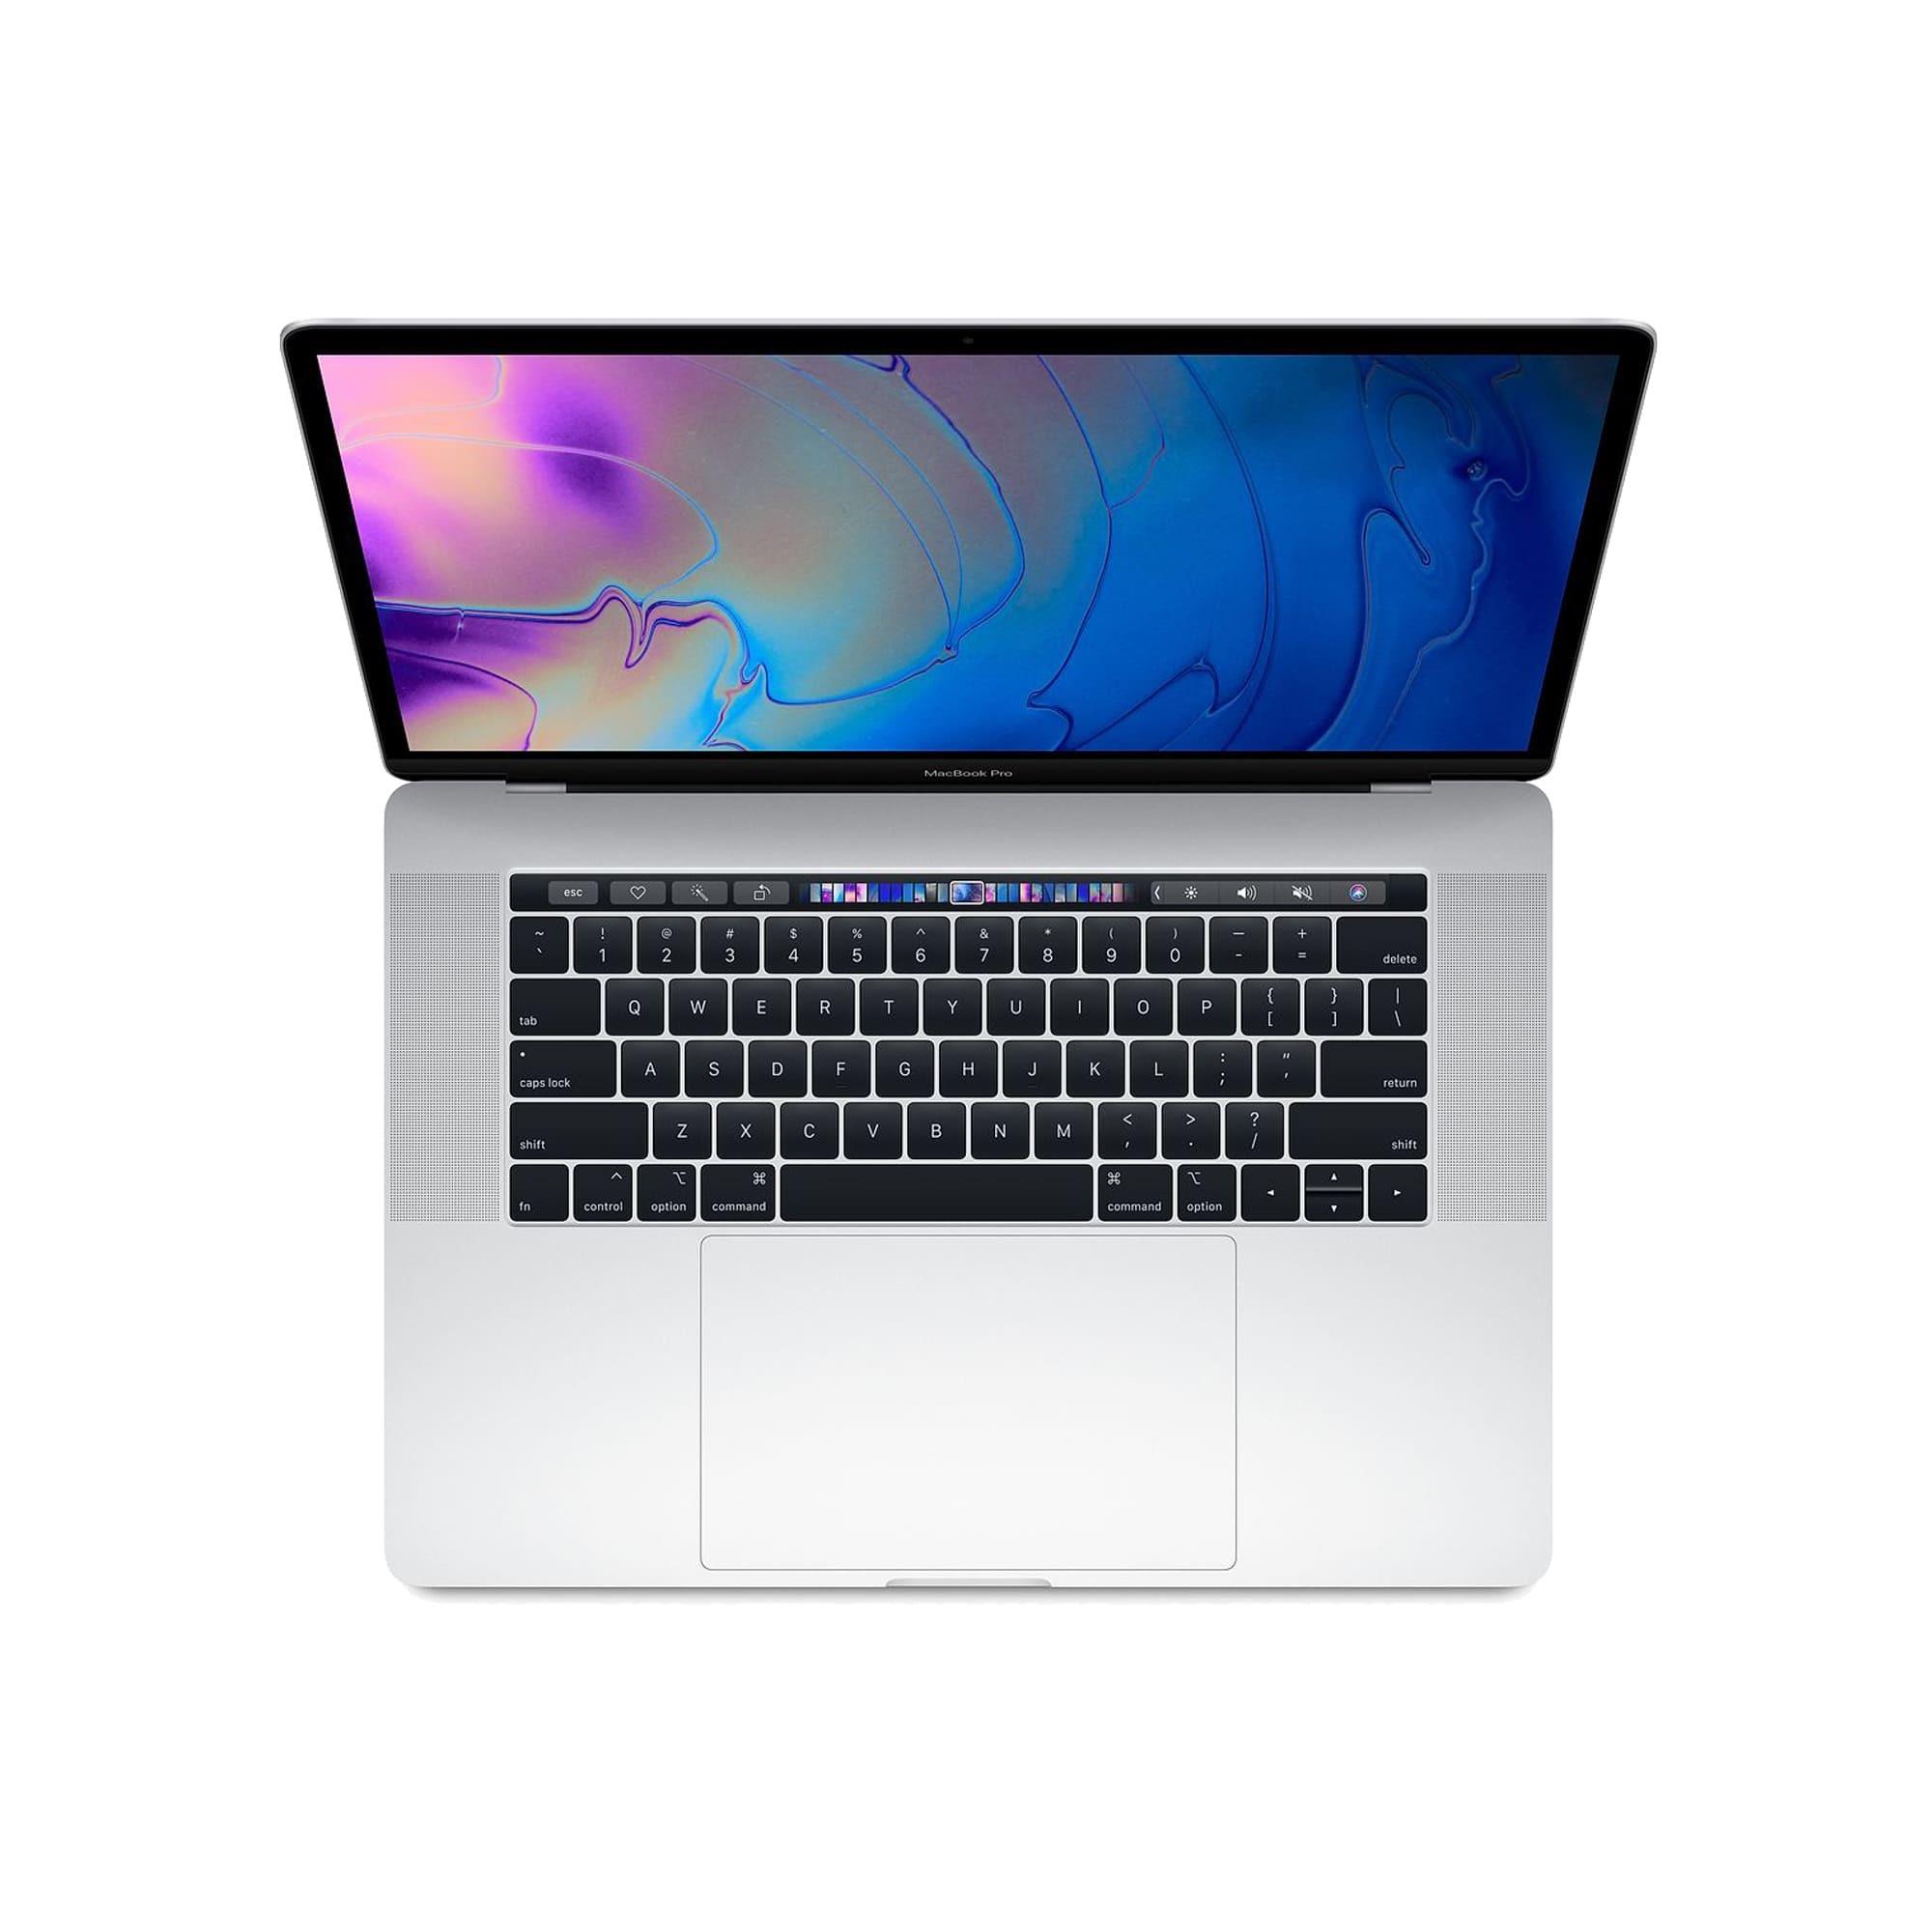 Vendere-Valutare-MacBook Pro Retina 15 pollici